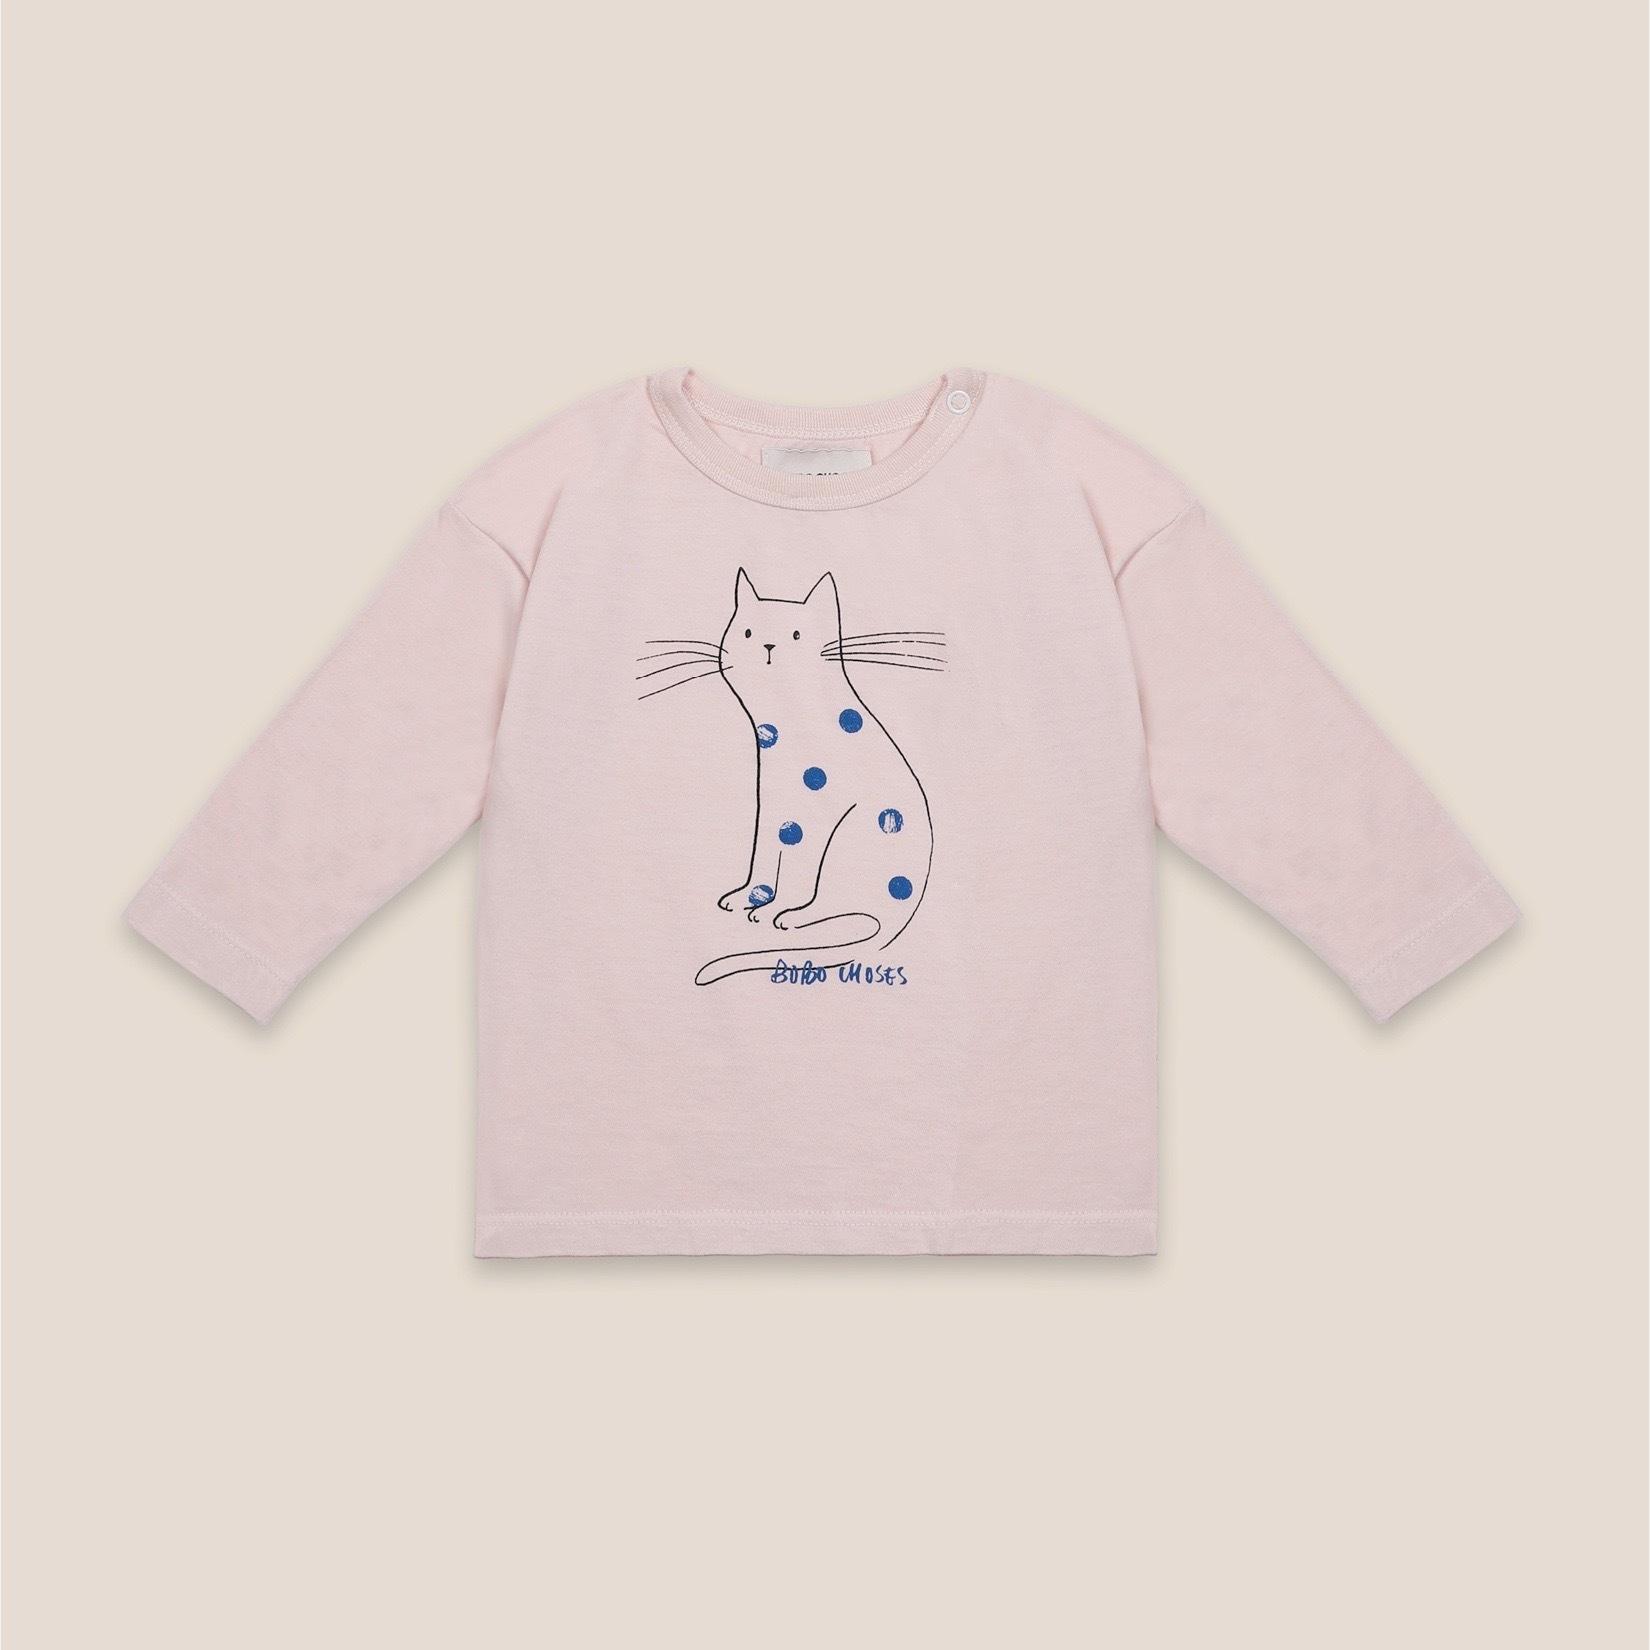 《BOBO CHOSES 2020AW》Cat long sleeve T-shirt / 6-36M